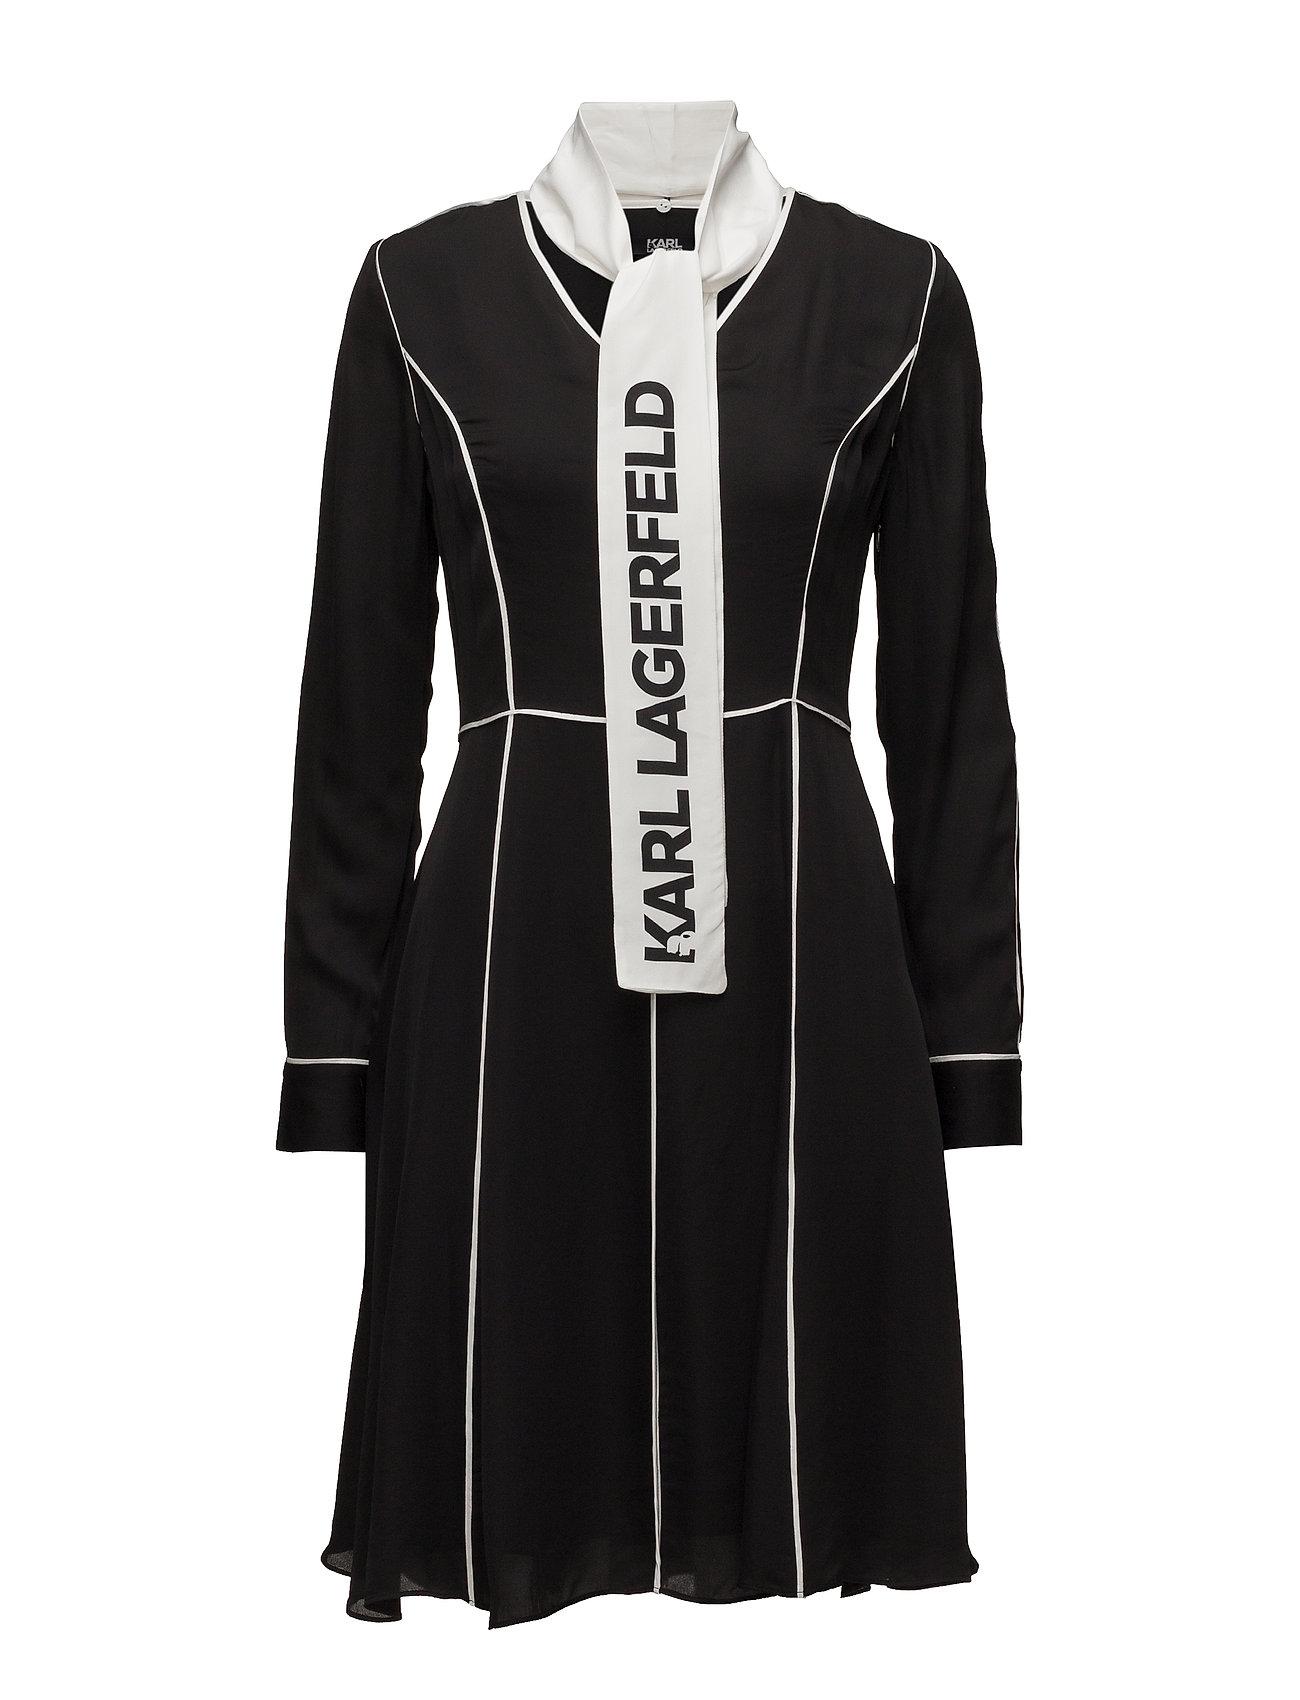 Karl Lagerfeld Karl Lagerfeld-Logo Bow Dress W  Piping Musta 9d2a43b500